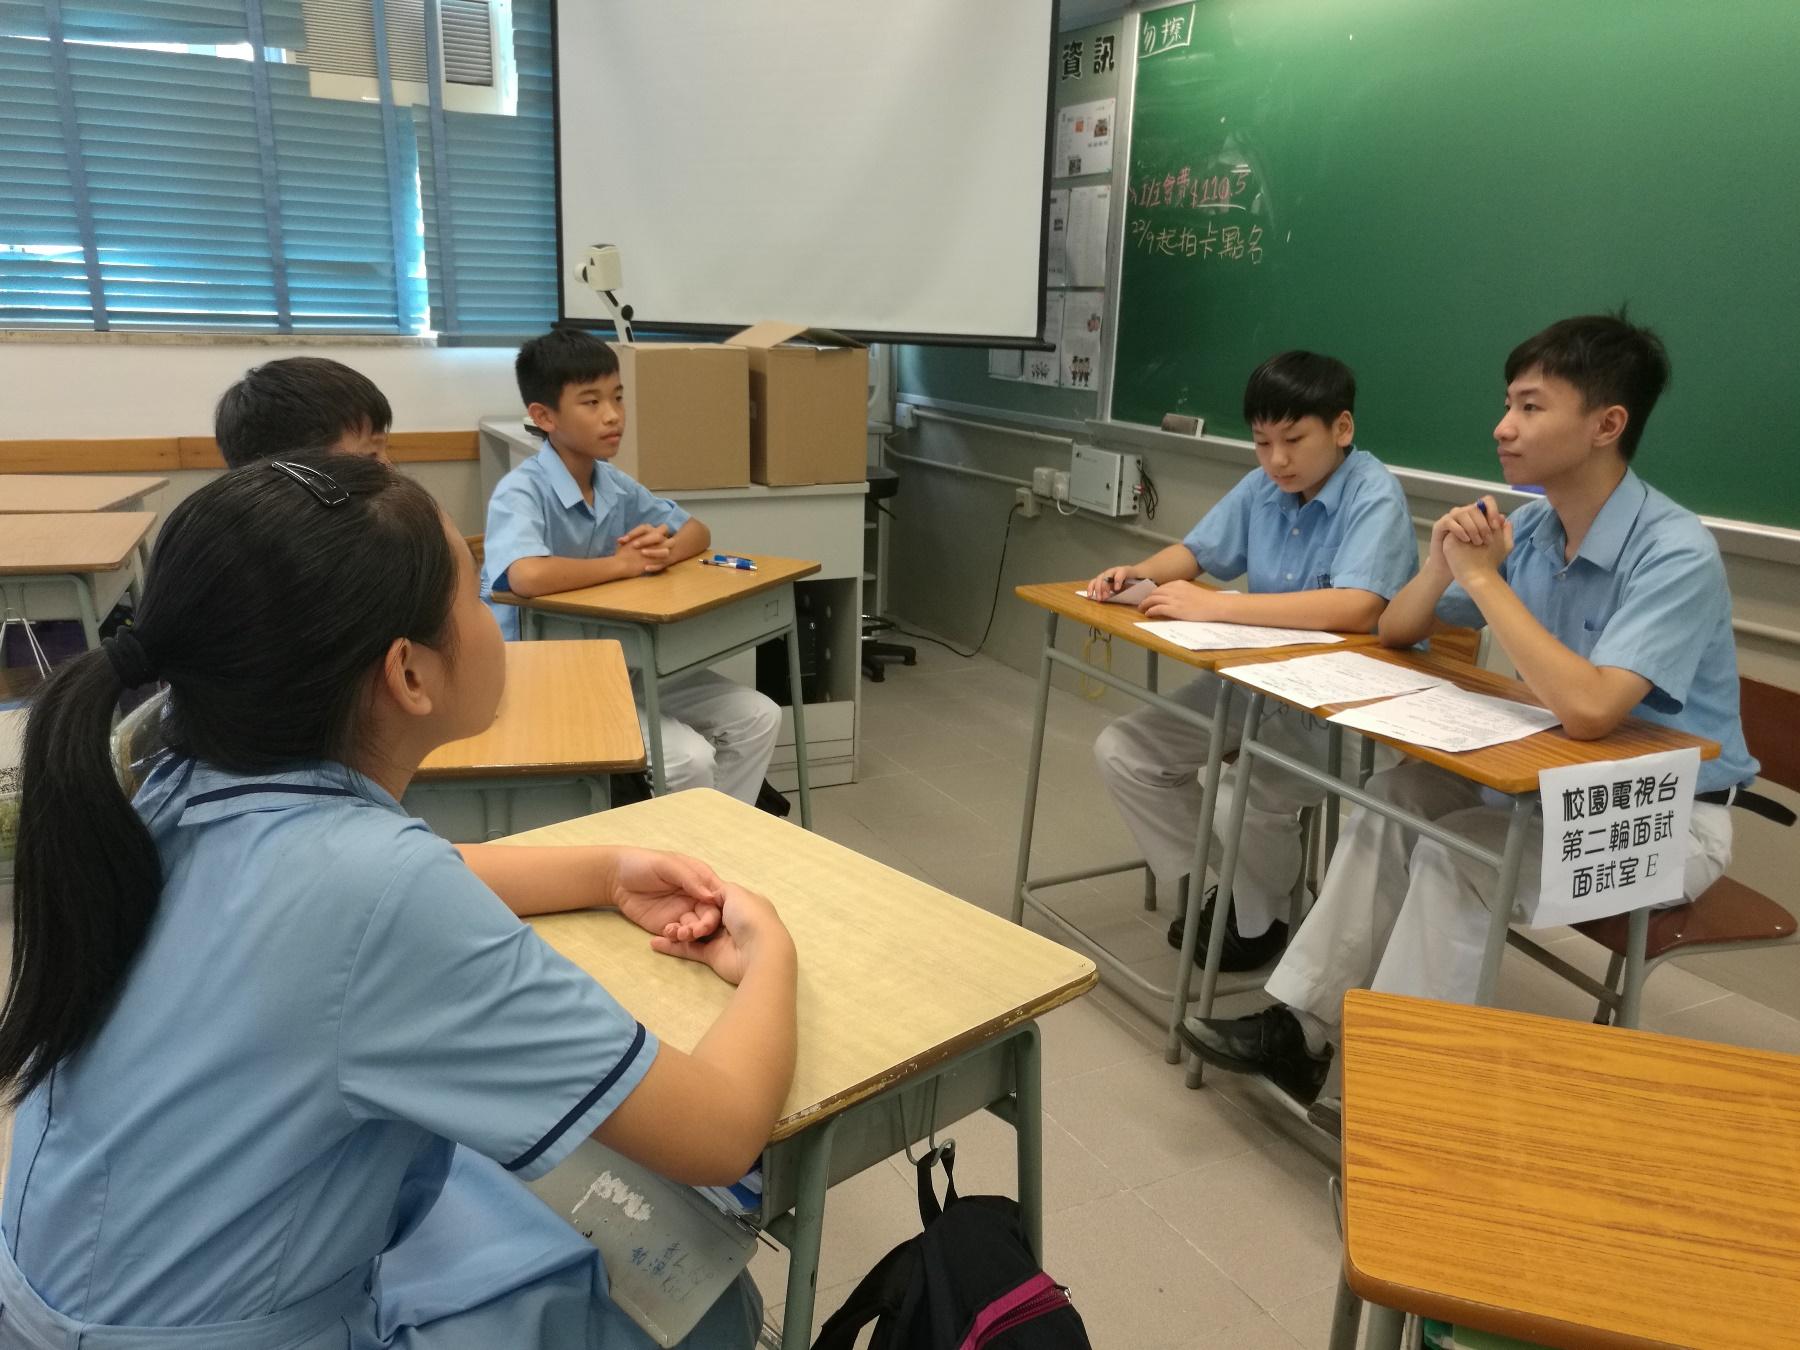 http://www.npc.edu.hk/sites/default/files/img_20170920_163229.jpg